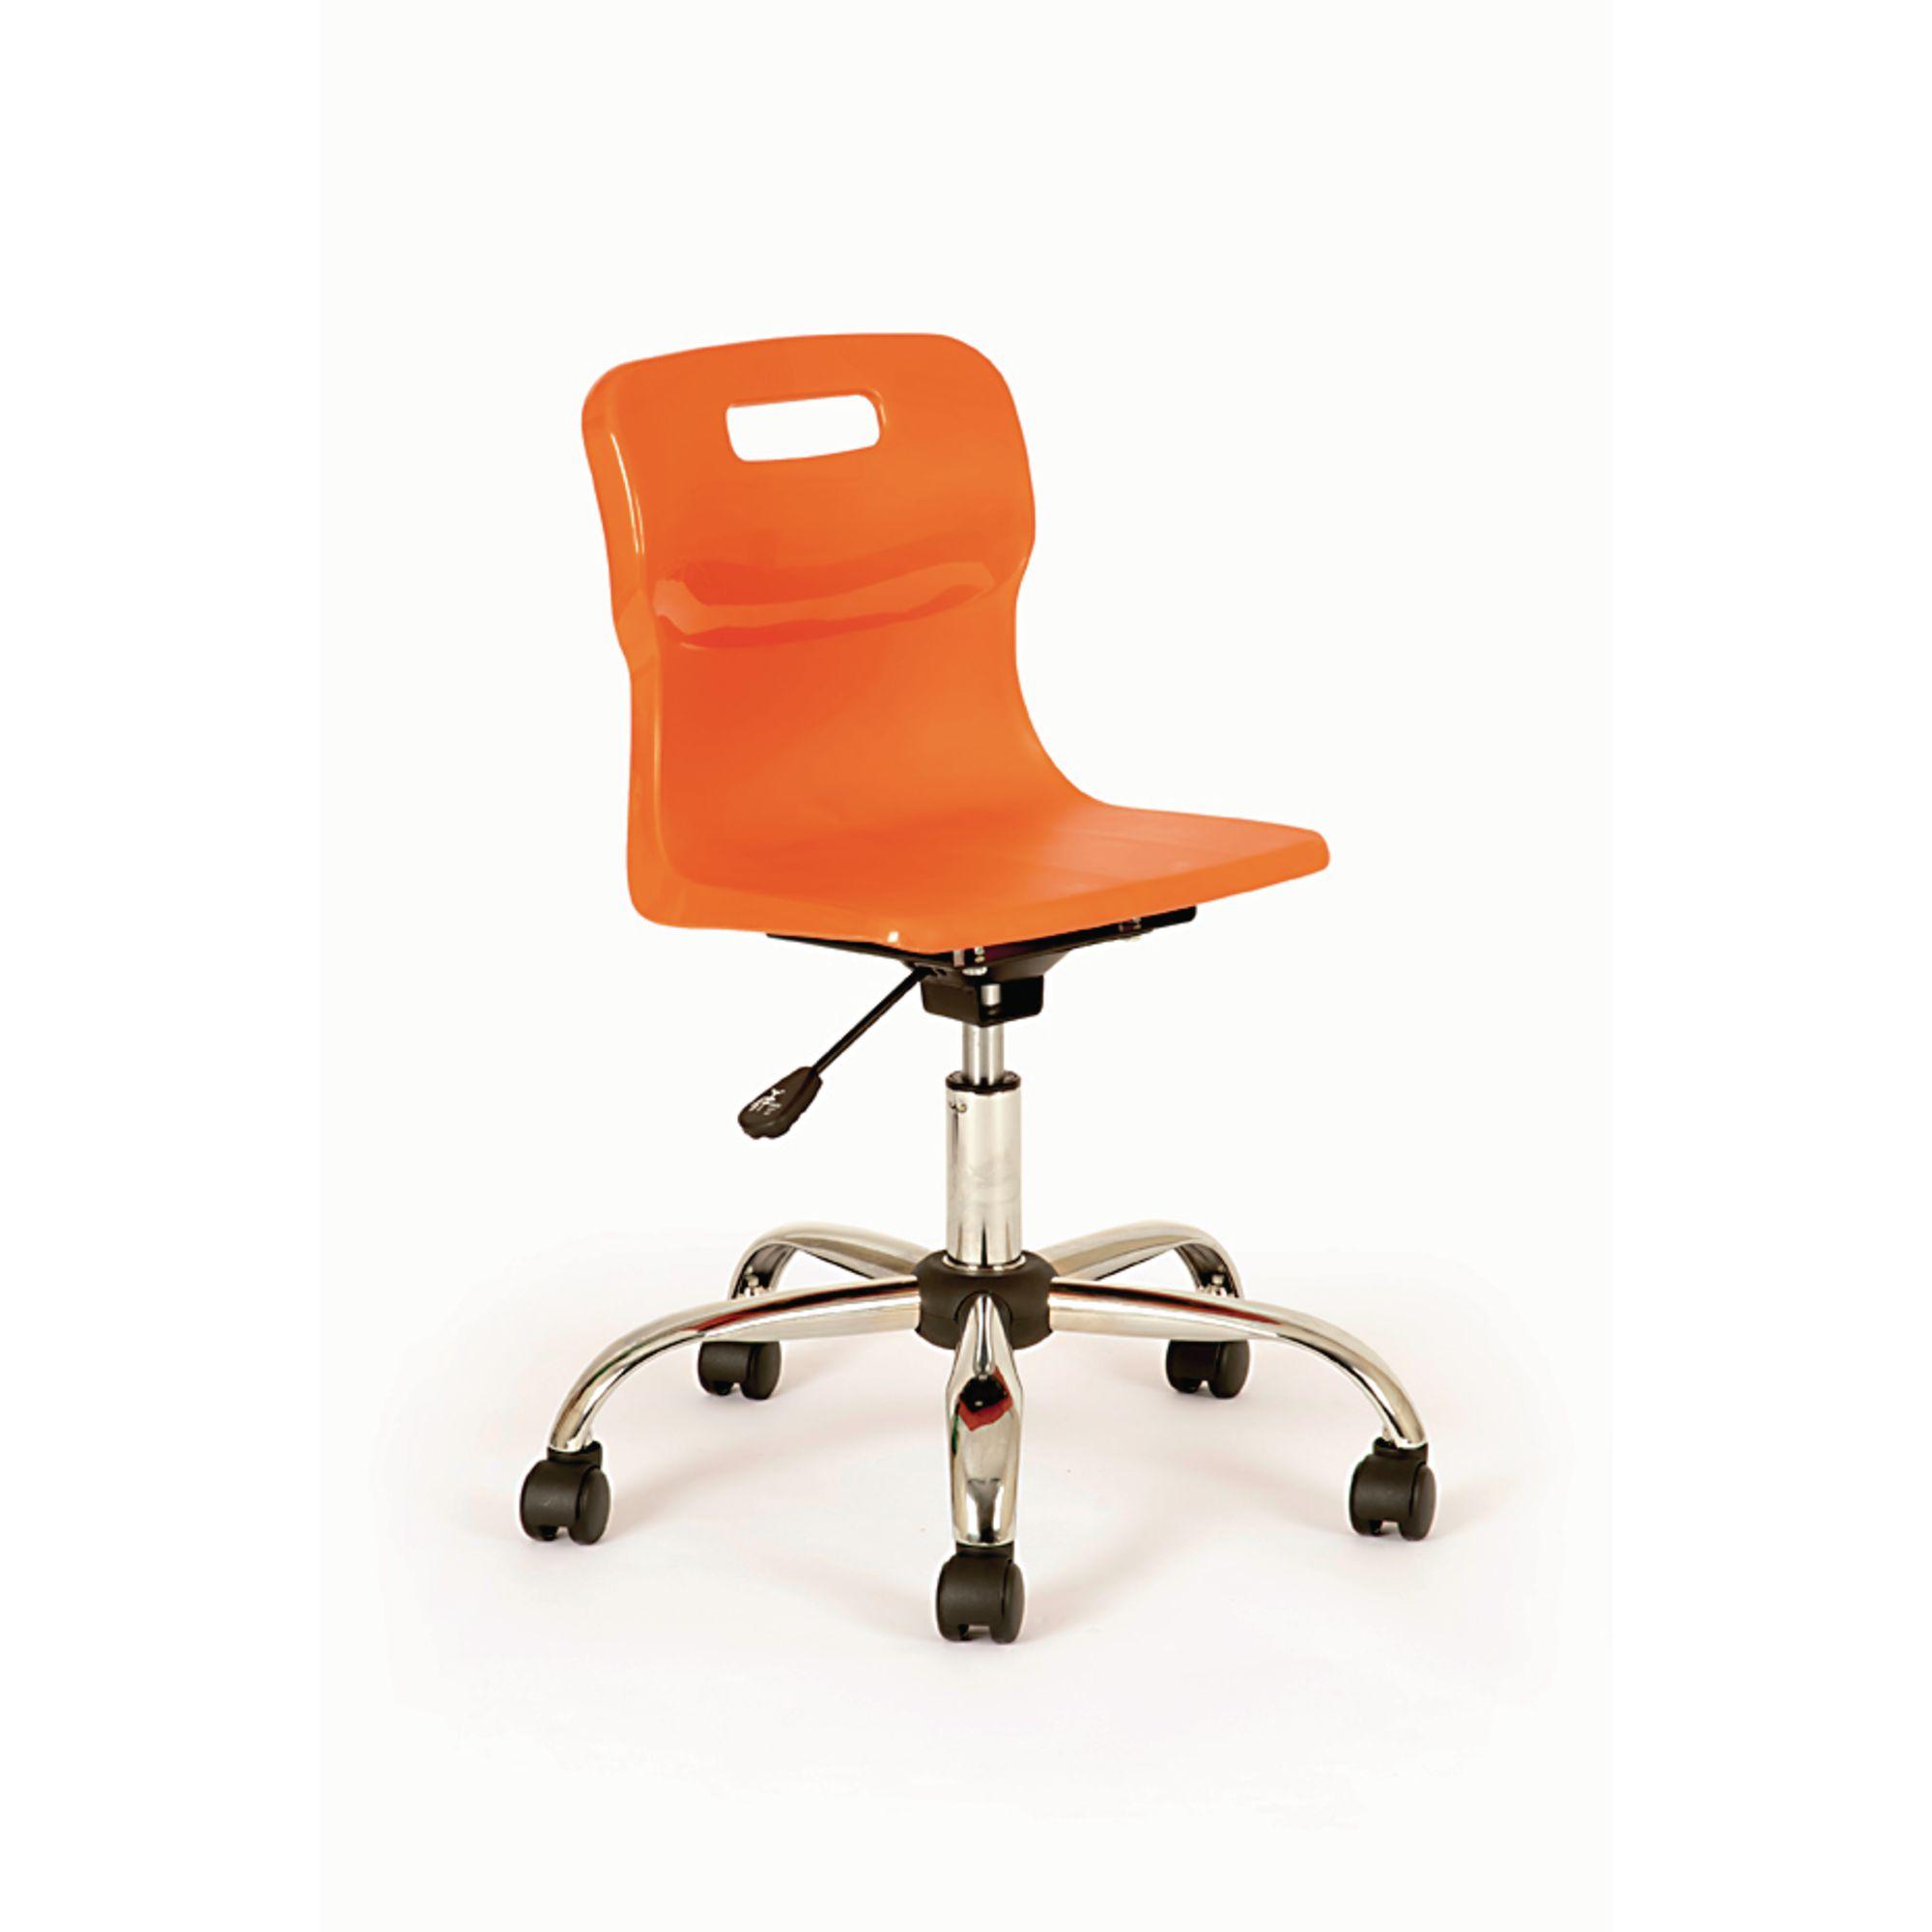 Titan Swivel Chairs Senior Castors Chair